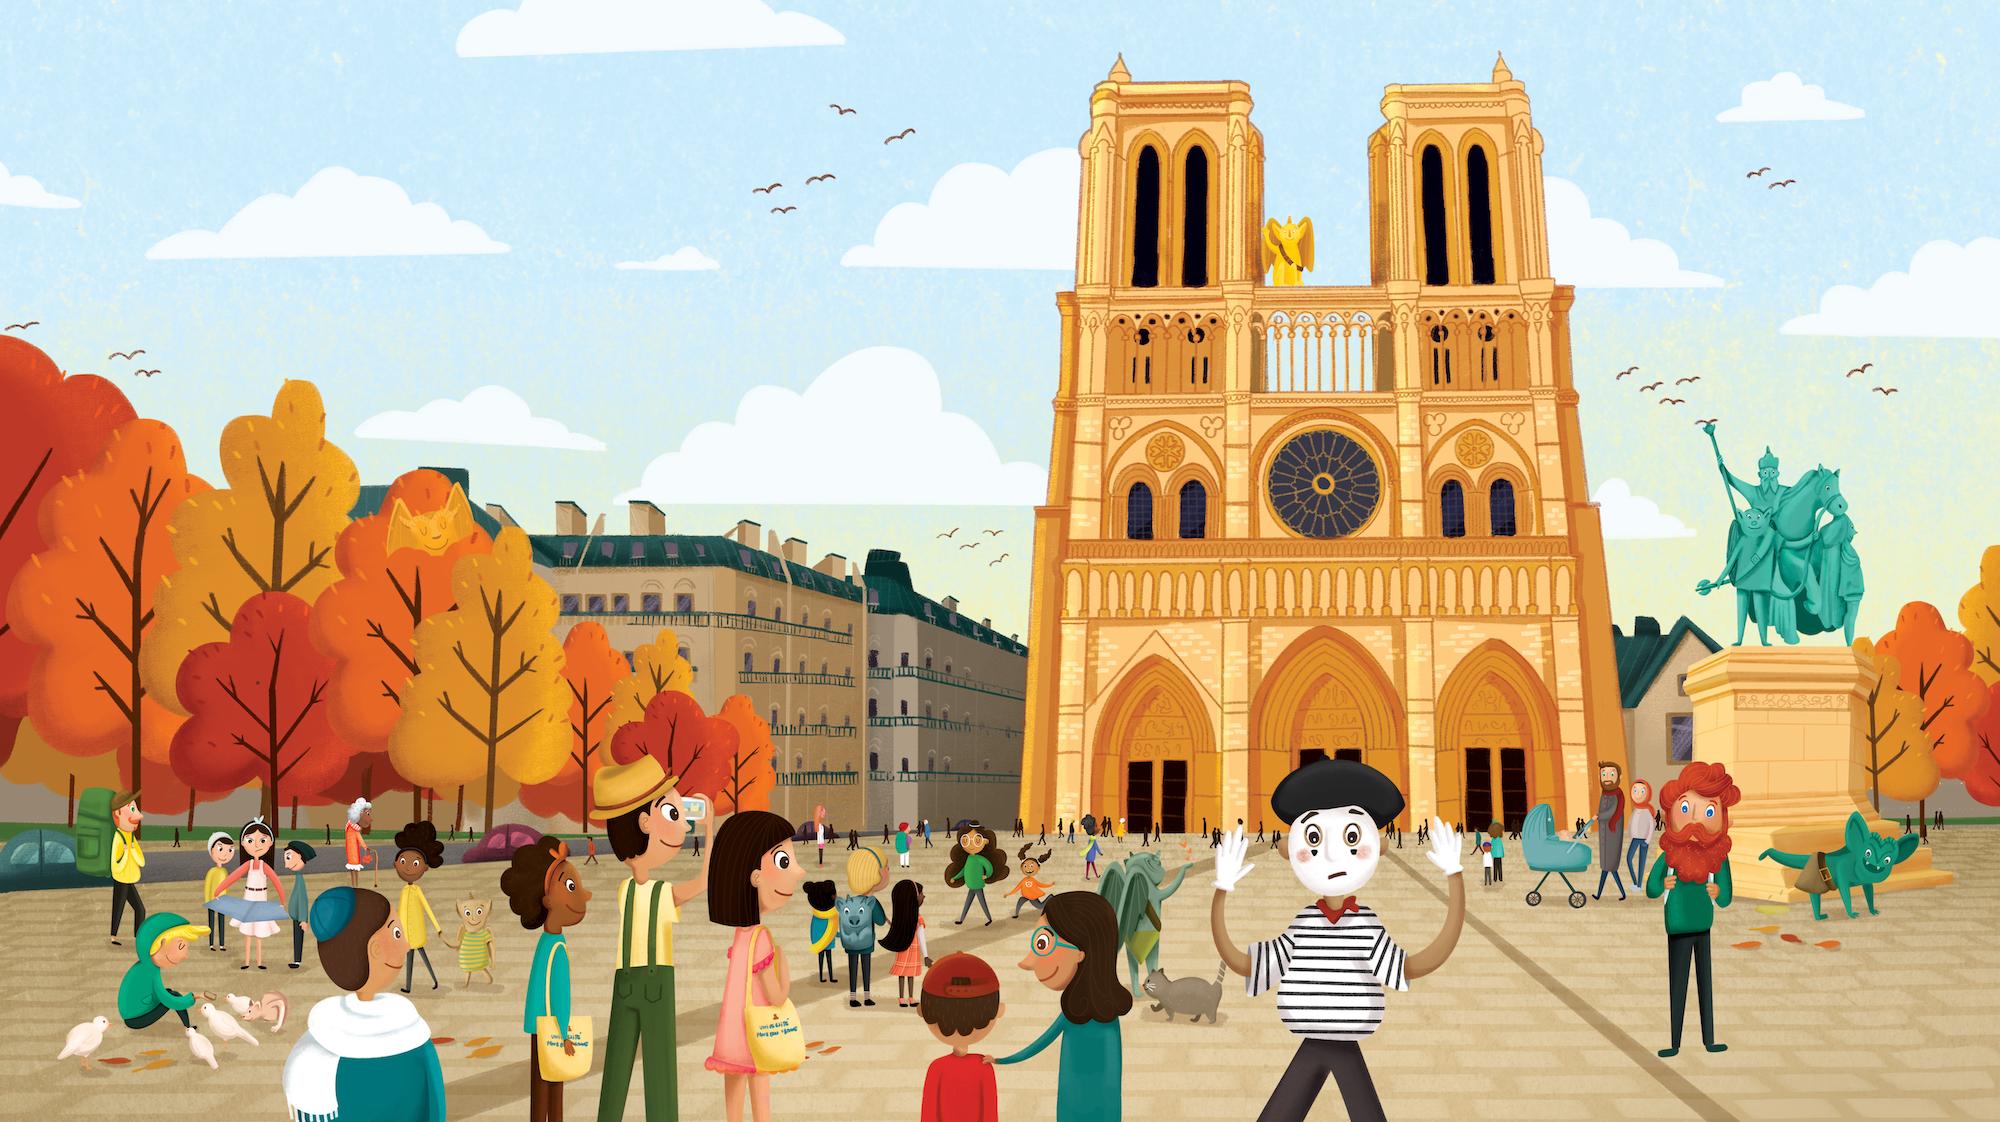 forte_vanessa_children's_illustration_paris_monsters